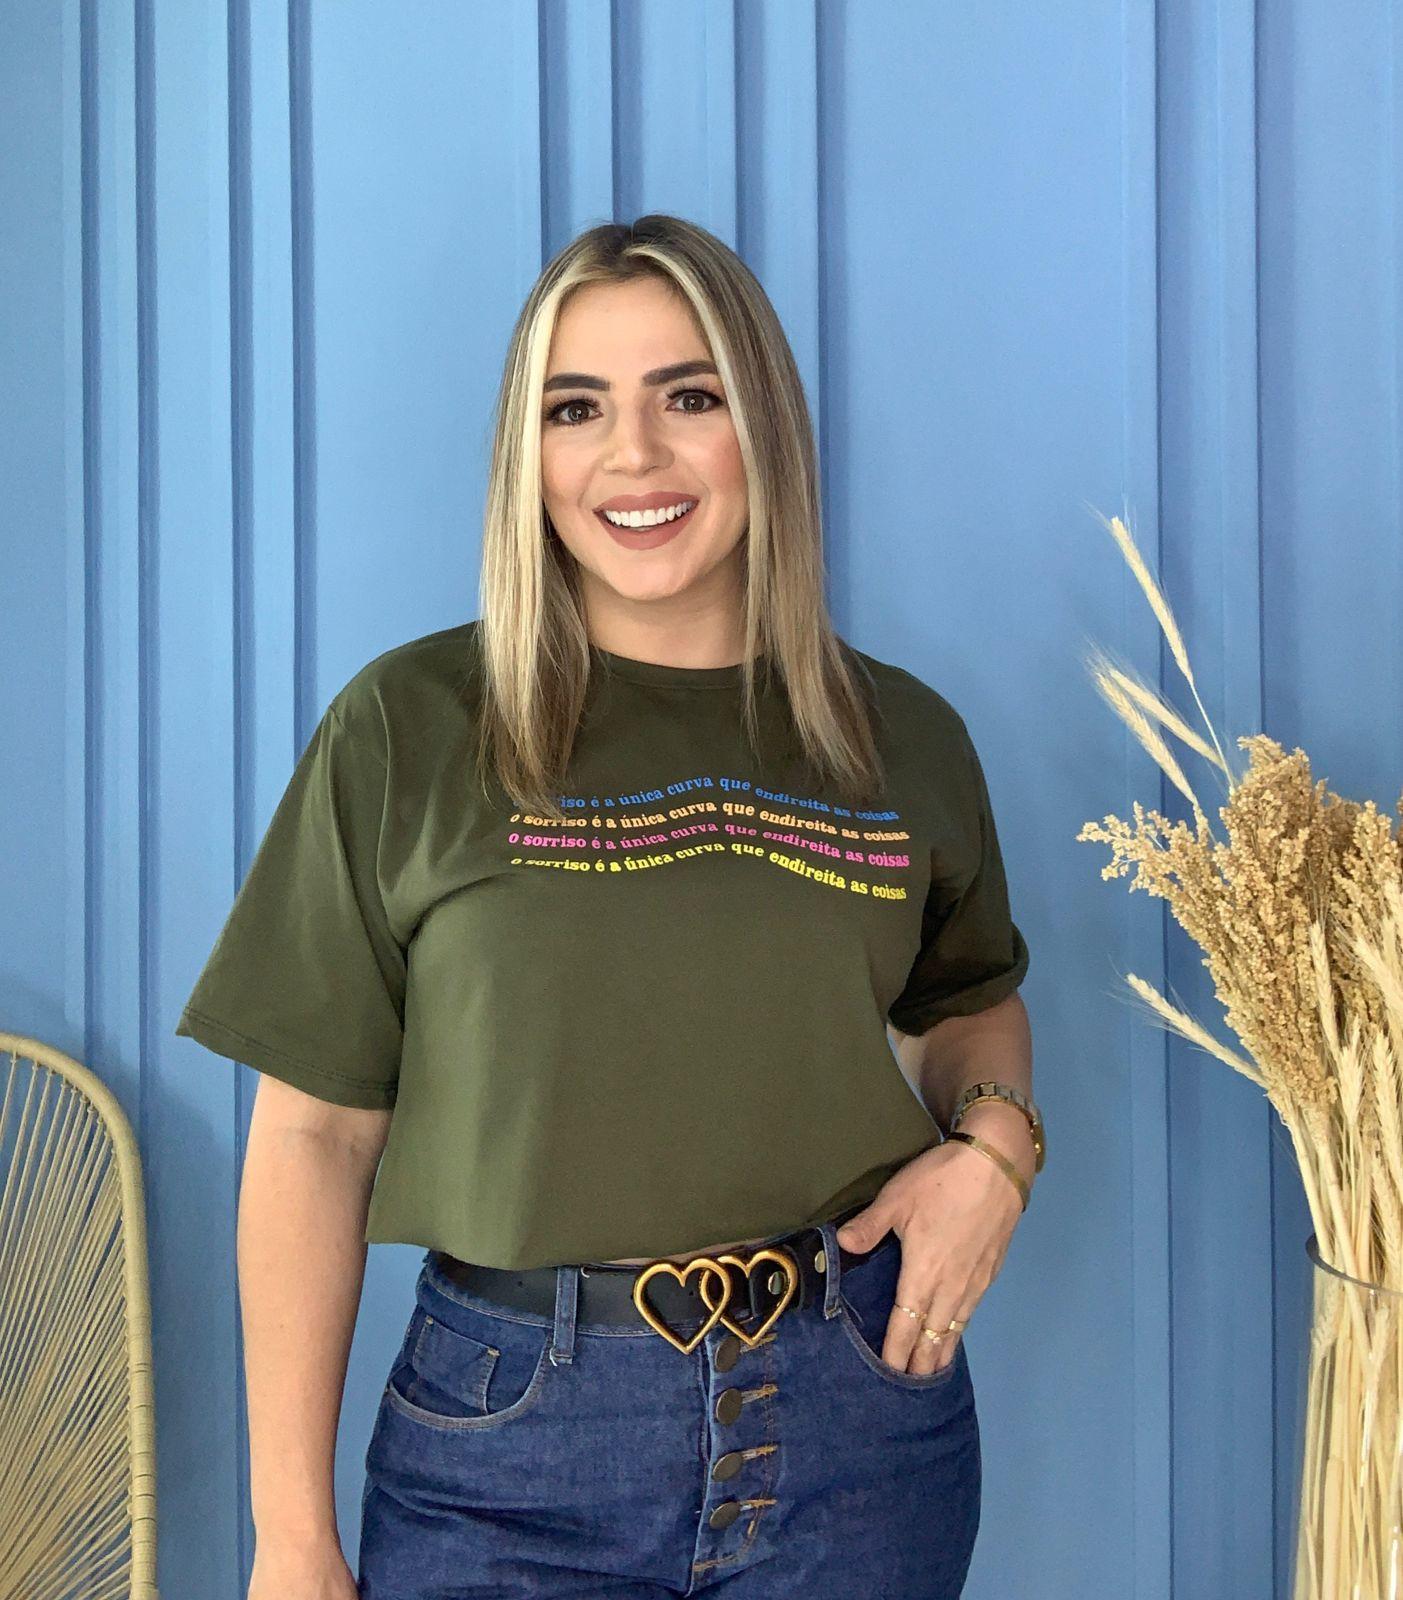 Blusa T-Shirt Cropped Verde Militar Estampa Sorriso Phelps